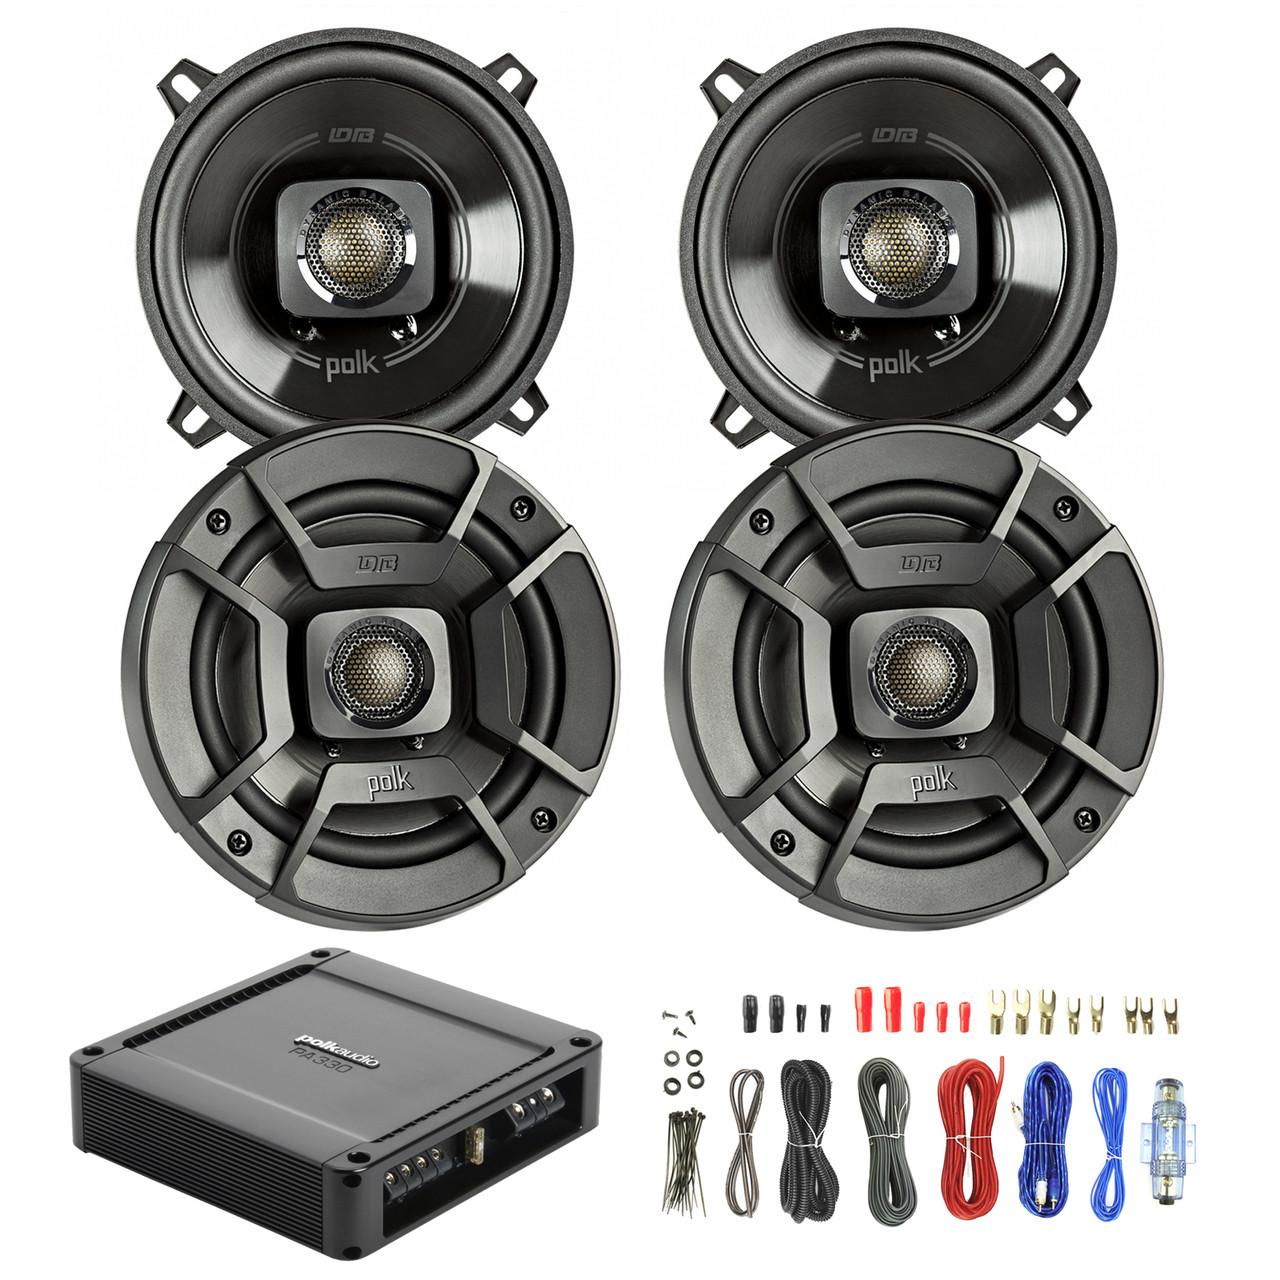 small resolution of 4x polk audio db522 5 25 inch 300 watt 2 way speakers new